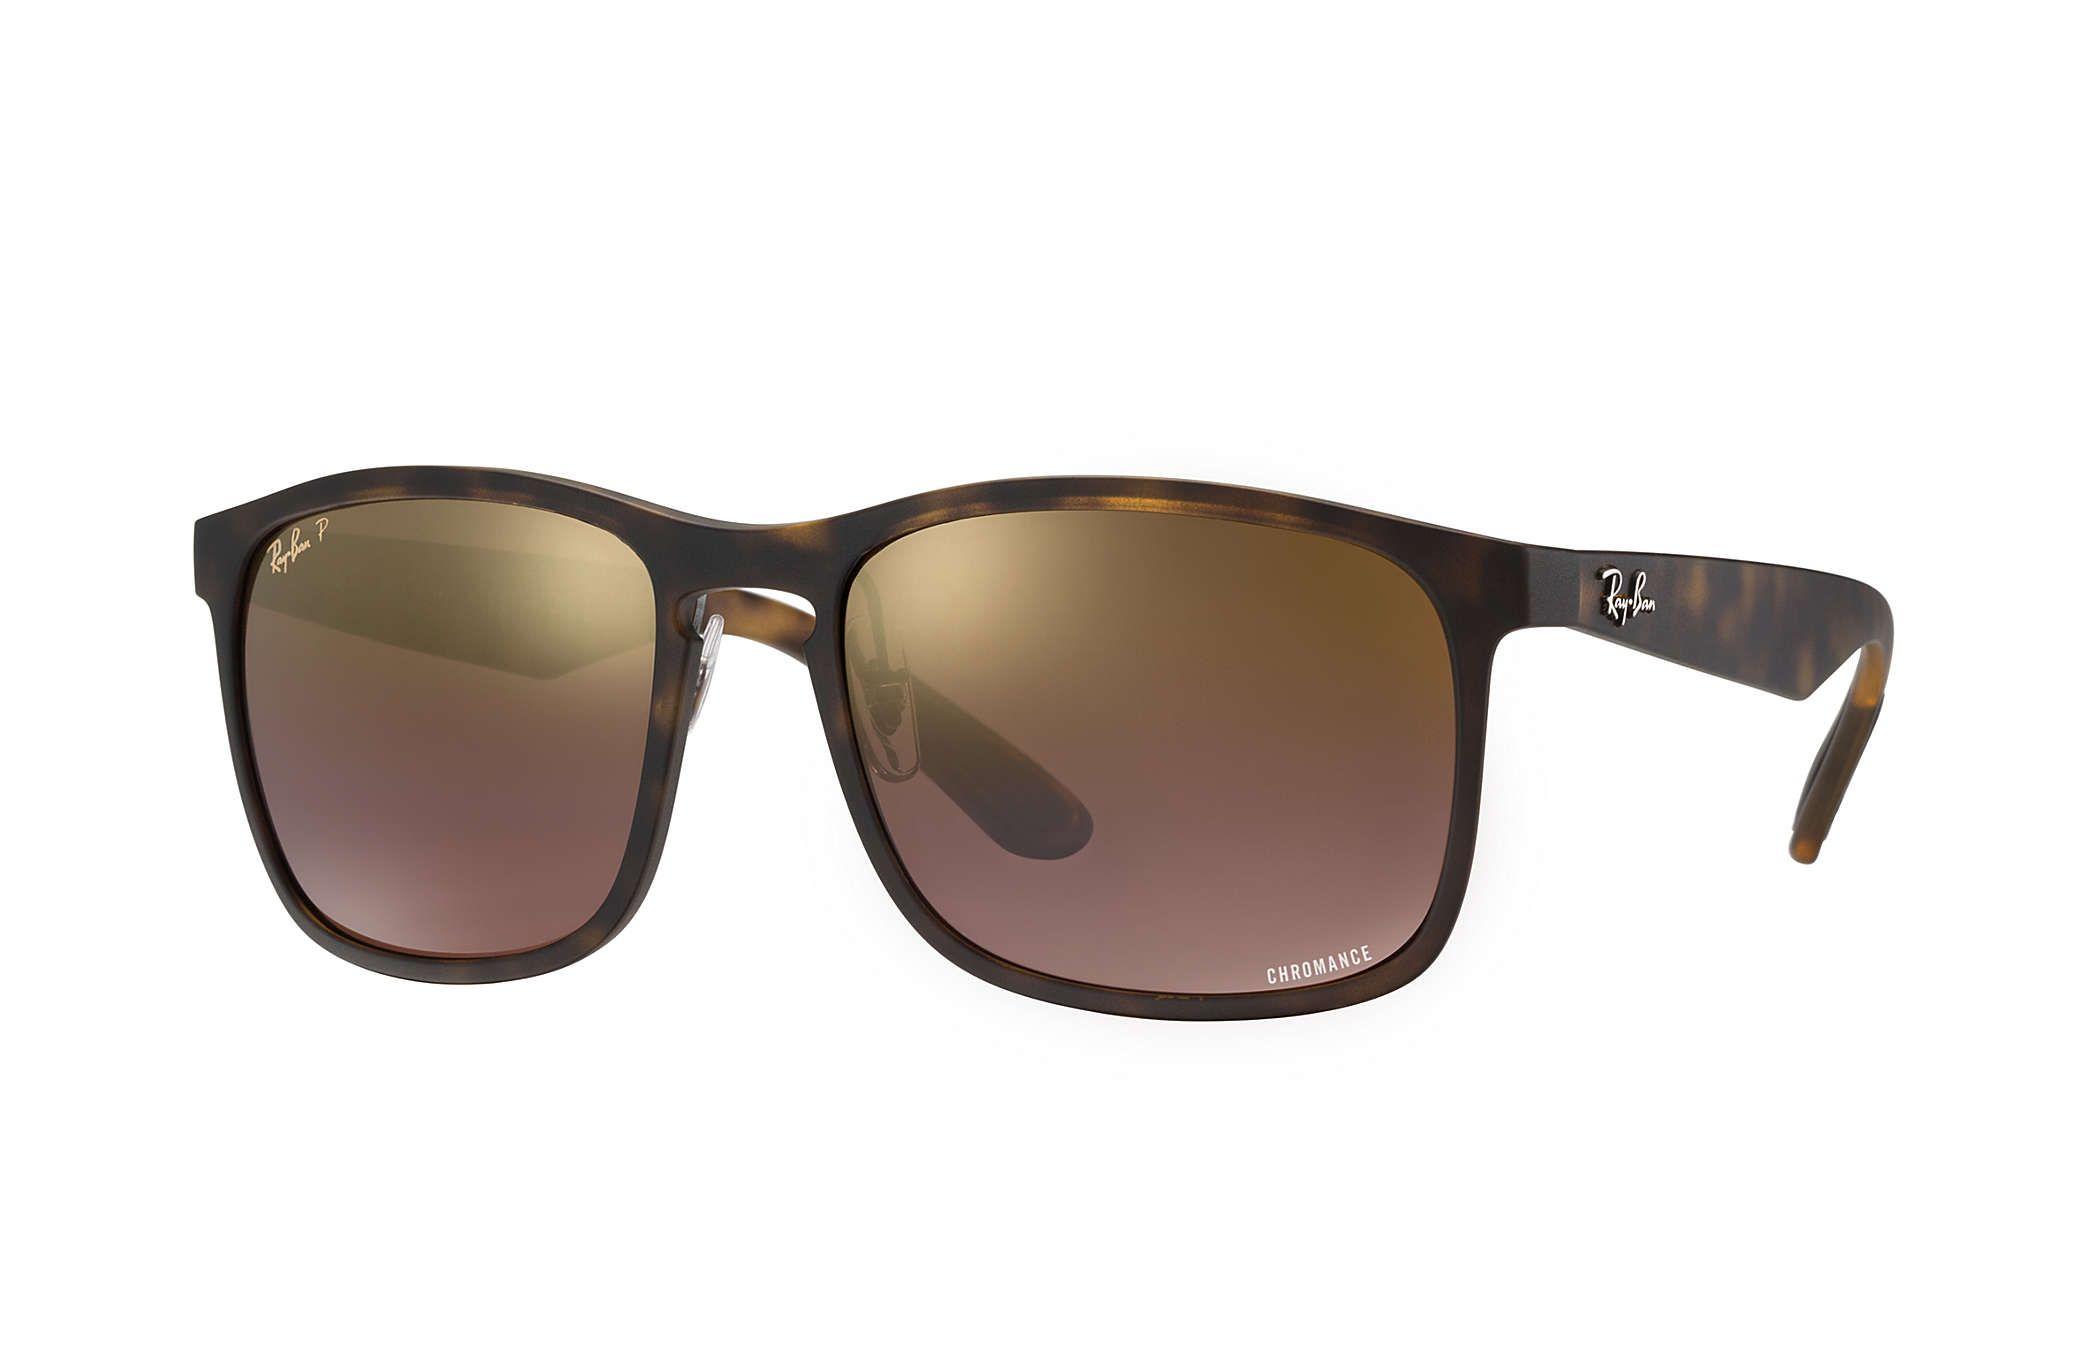 af8cb5041 Luxottica S.p.A | Sunglasses | Ray bans, Sunglasses, Glasses